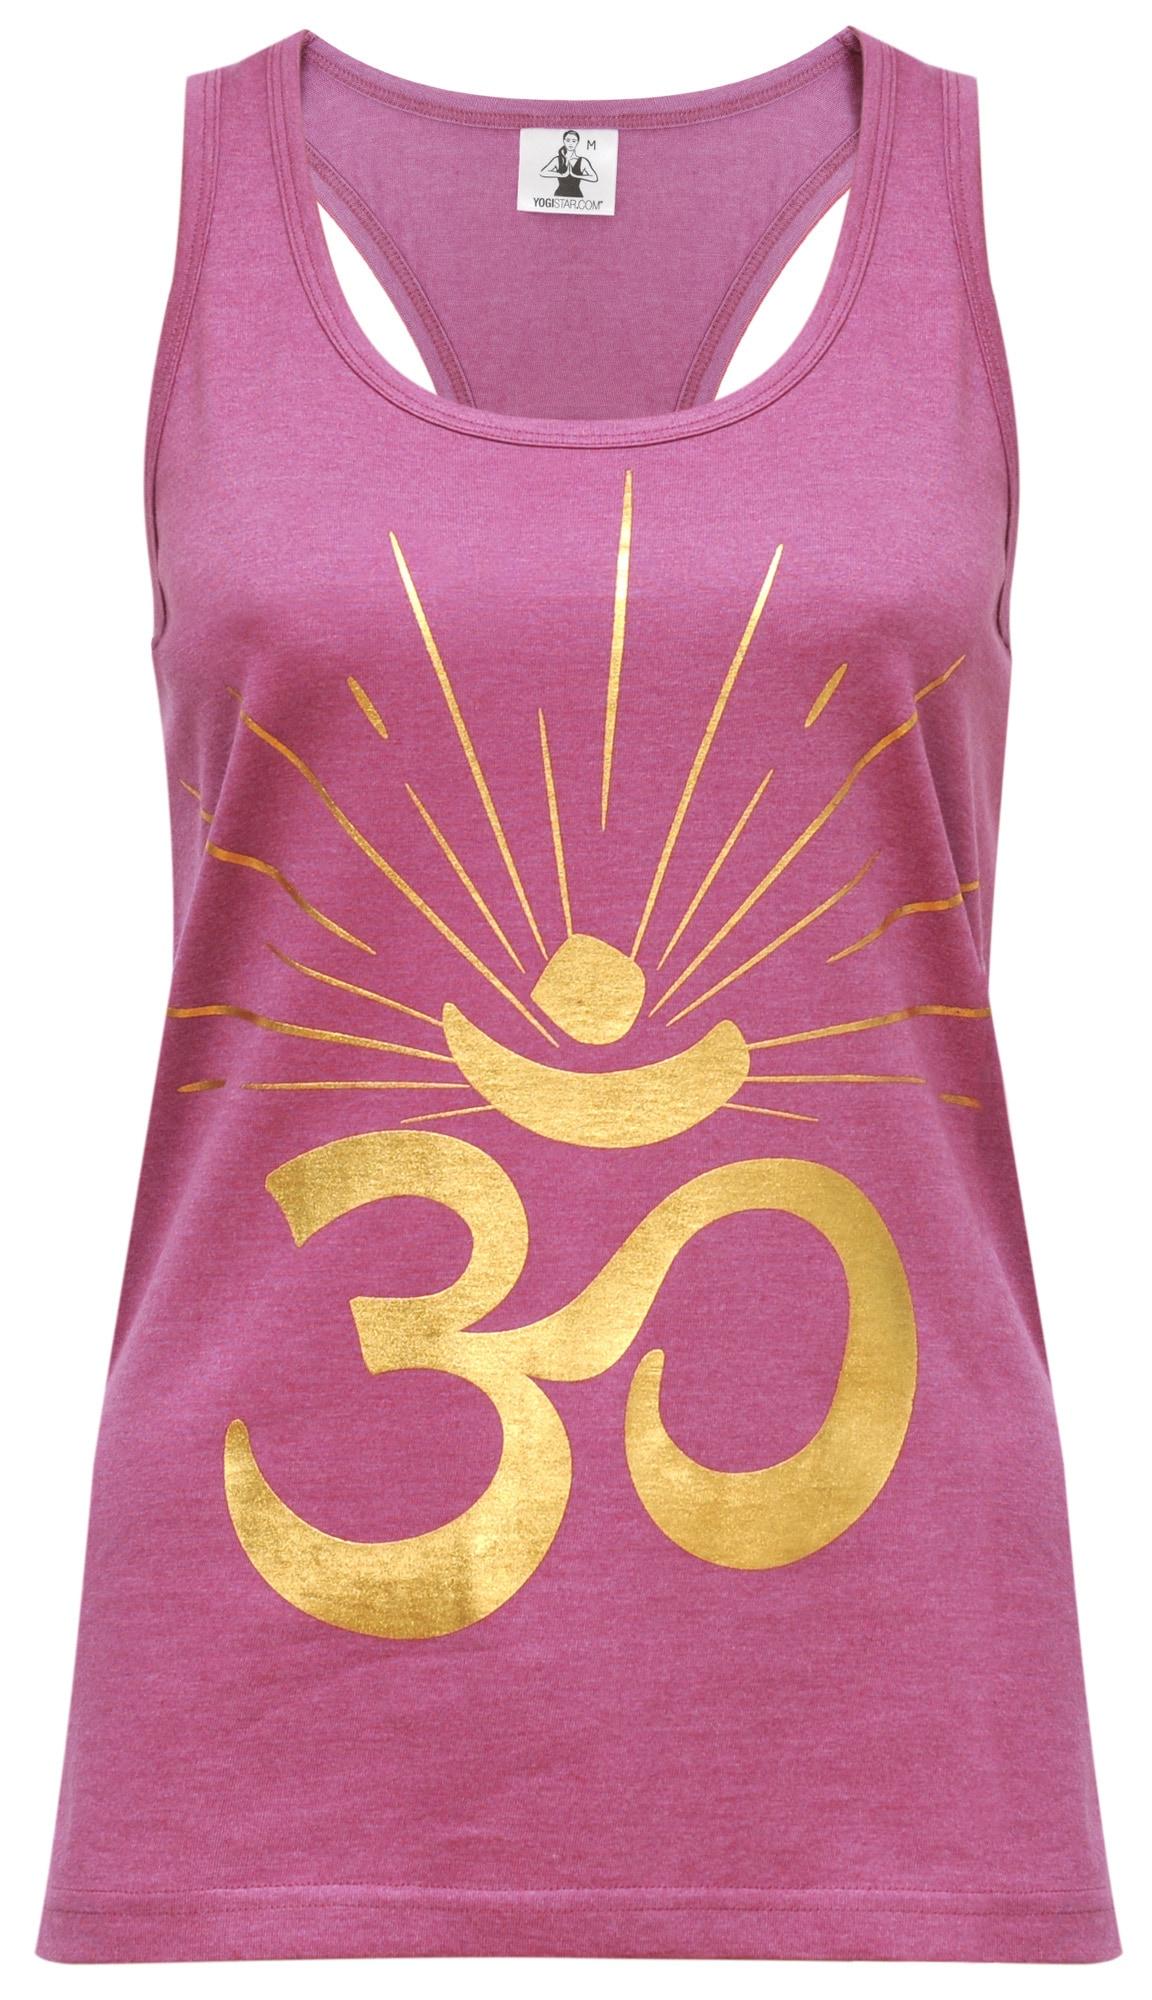 Yoga-Top om Sunray | Sportbekleidung > Sporttops > Yogatops | YOGISTAR.COM